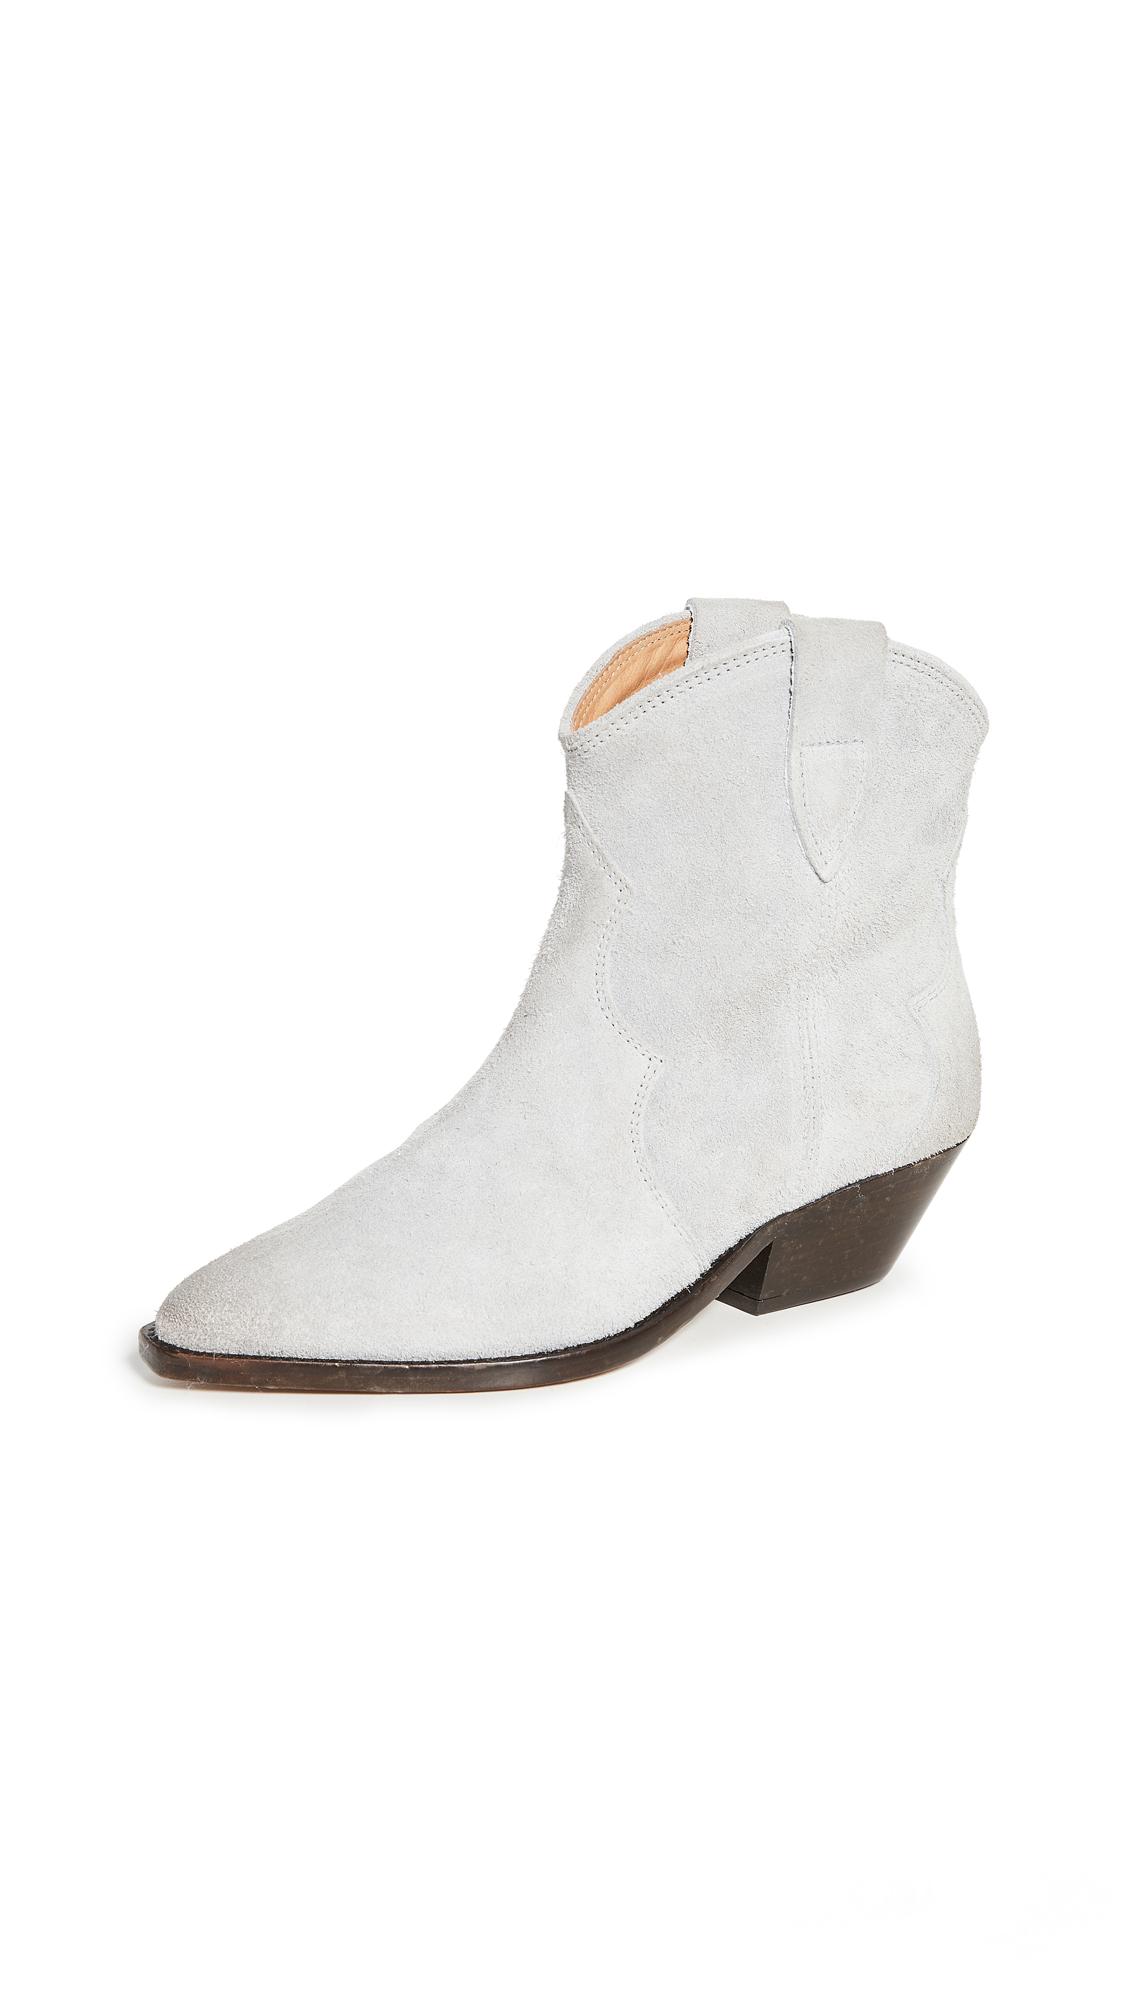 Isabel Marant Dewina Boots - 60% Off Sale